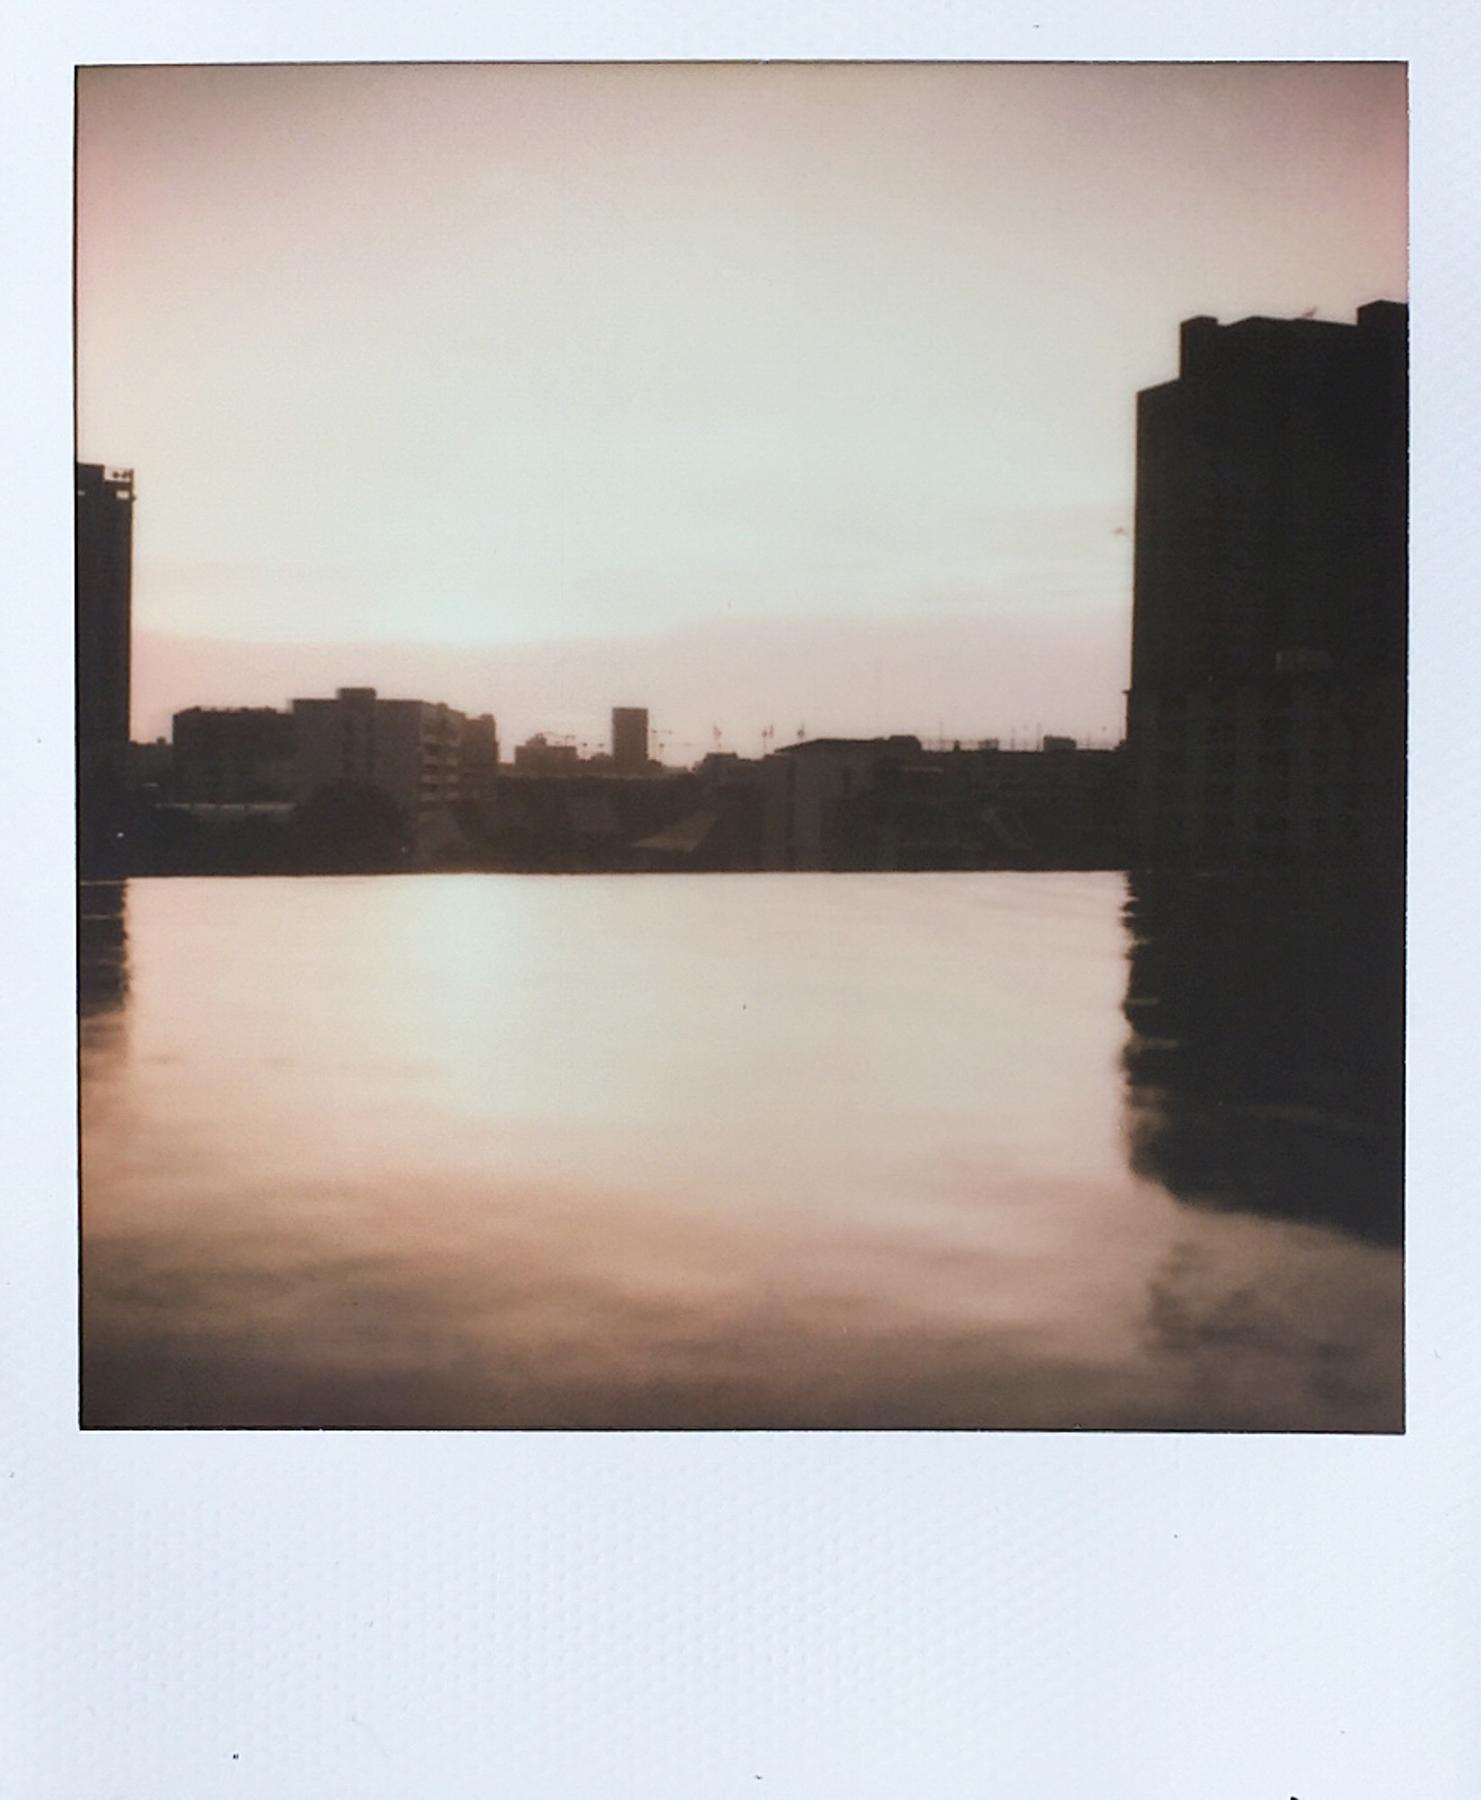 Pool | SX70 | Sorana Kaewmaneechai